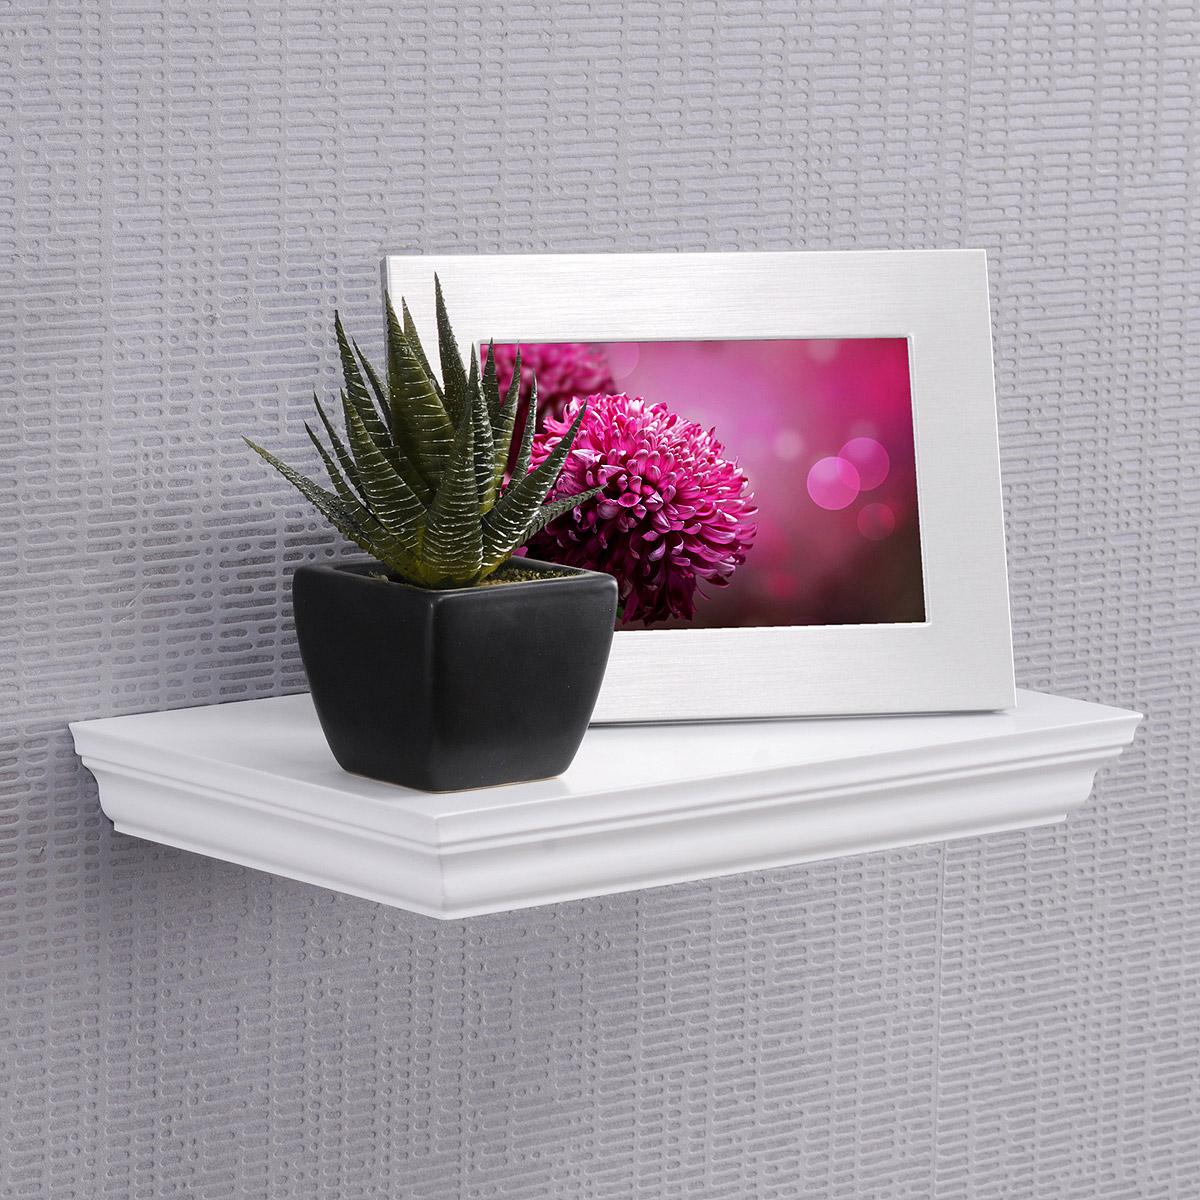 wandboard landwood 30 landhausstil regal wei 30cm breit ebay. Black Bedroom Furniture Sets. Home Design Ideas